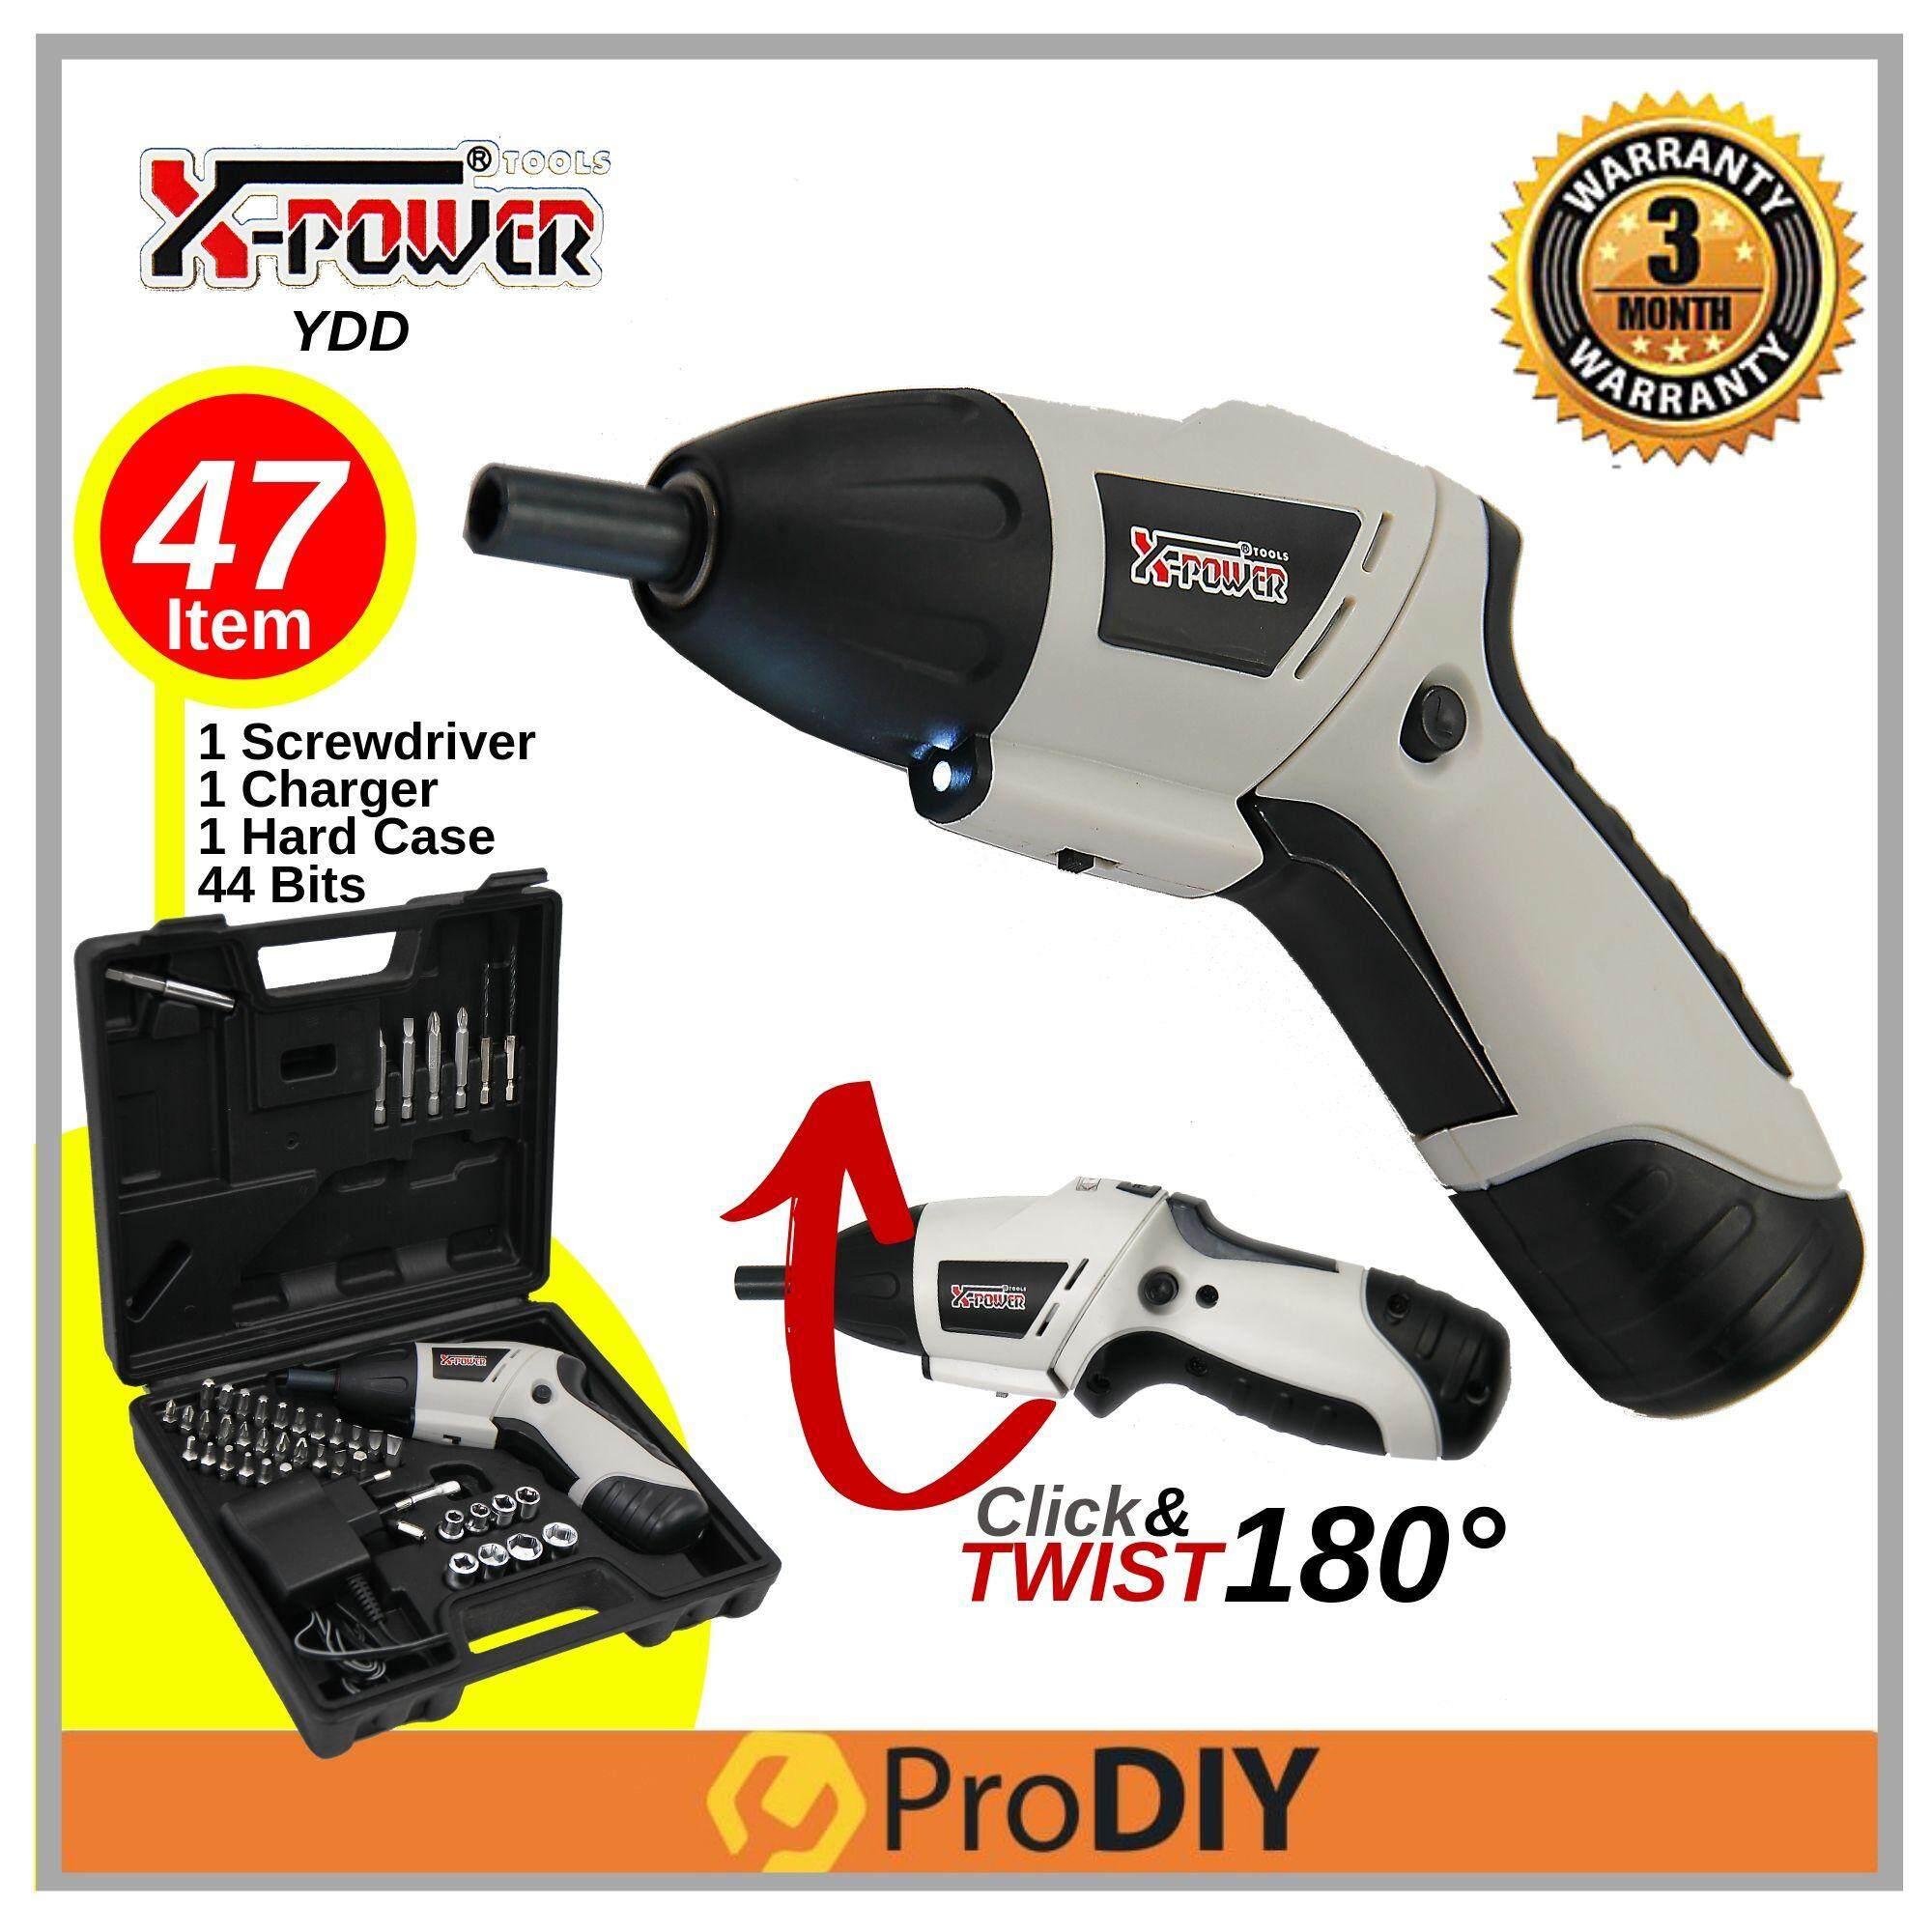 YDD KCS615 Cordless Screwdriver